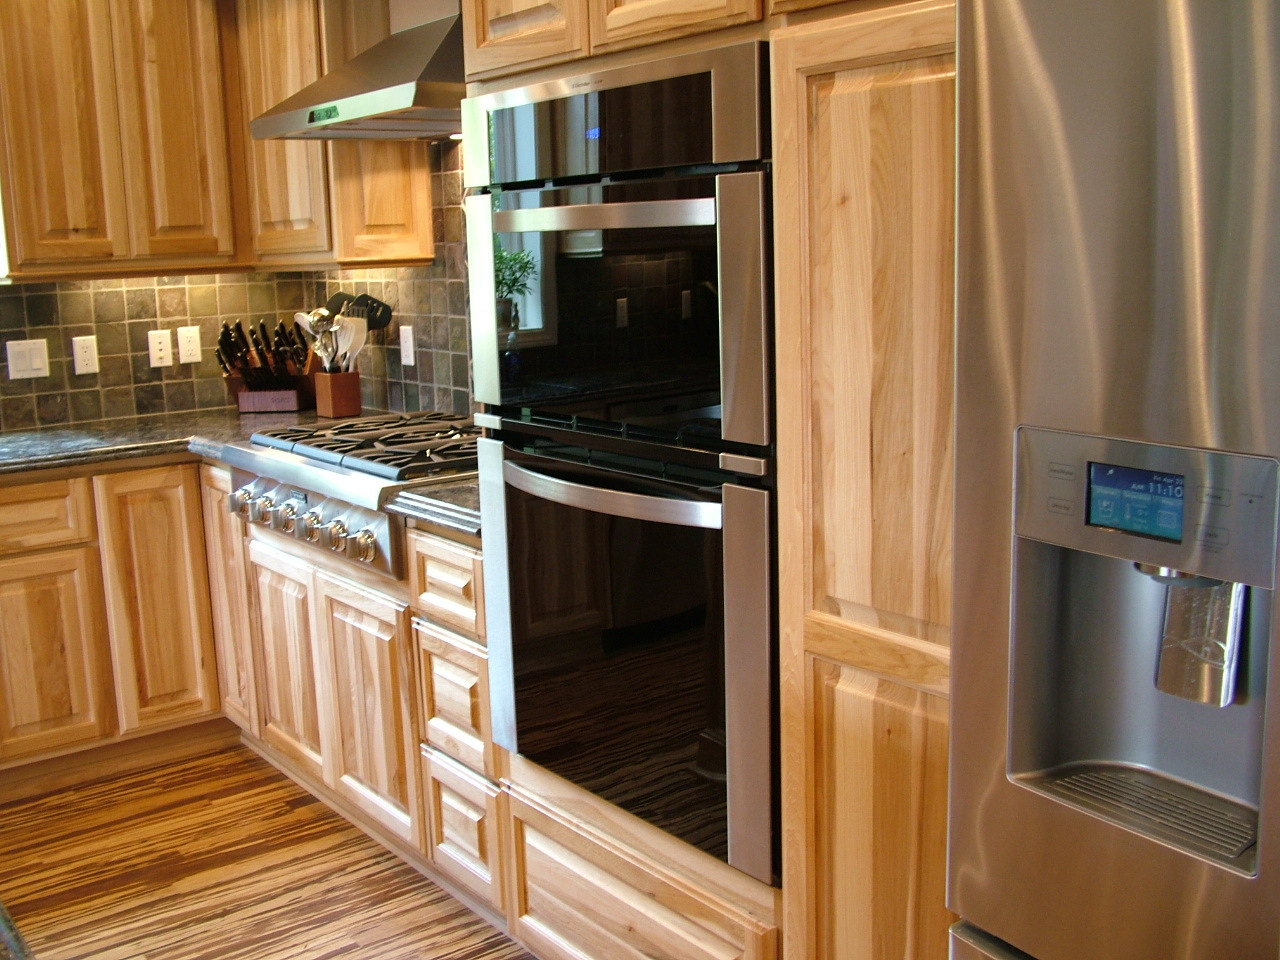 Hickory Kitchen Cabinets Outdoor Patio Scane Unique Calico